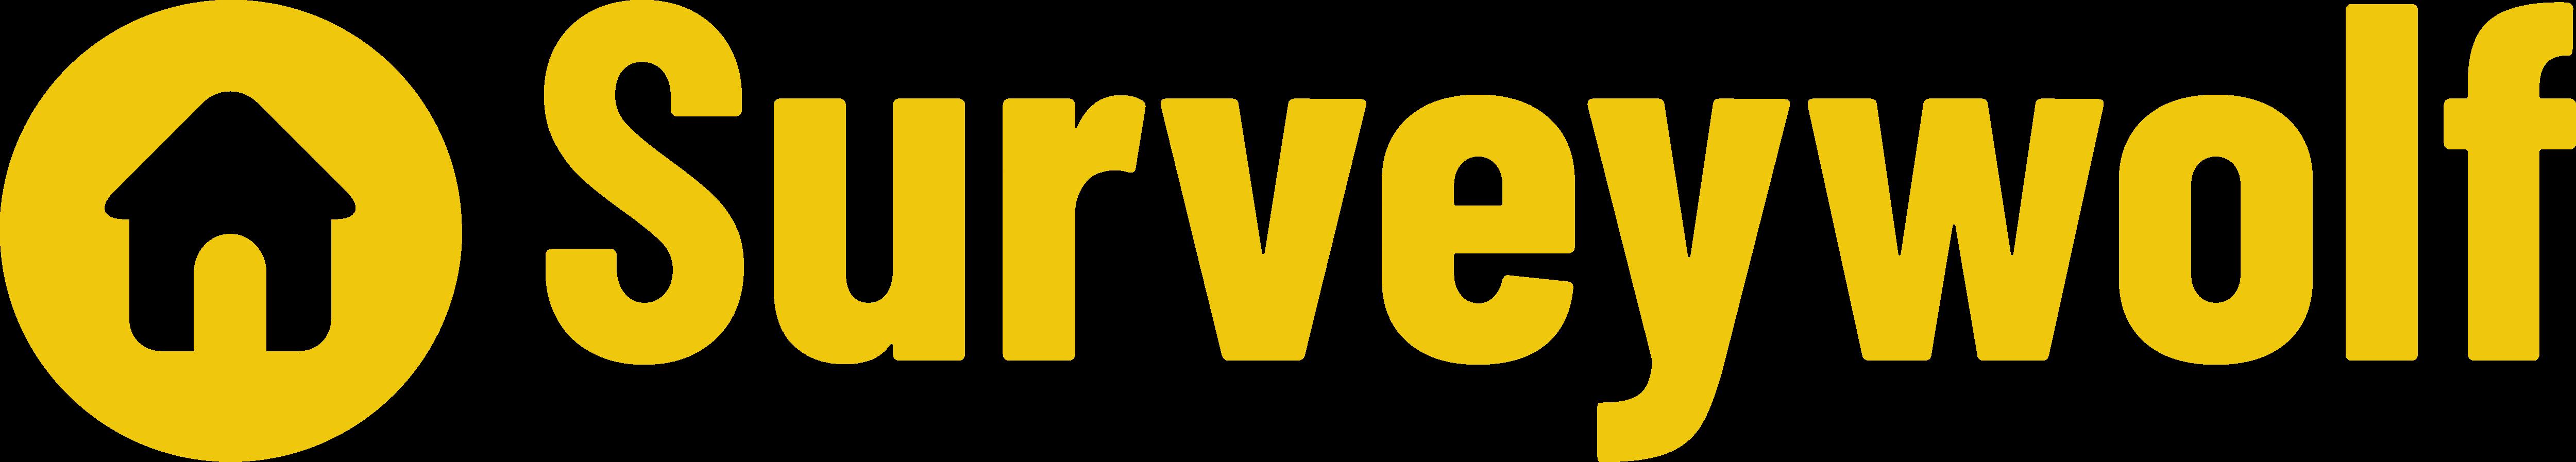 Surveywolf-Ltd